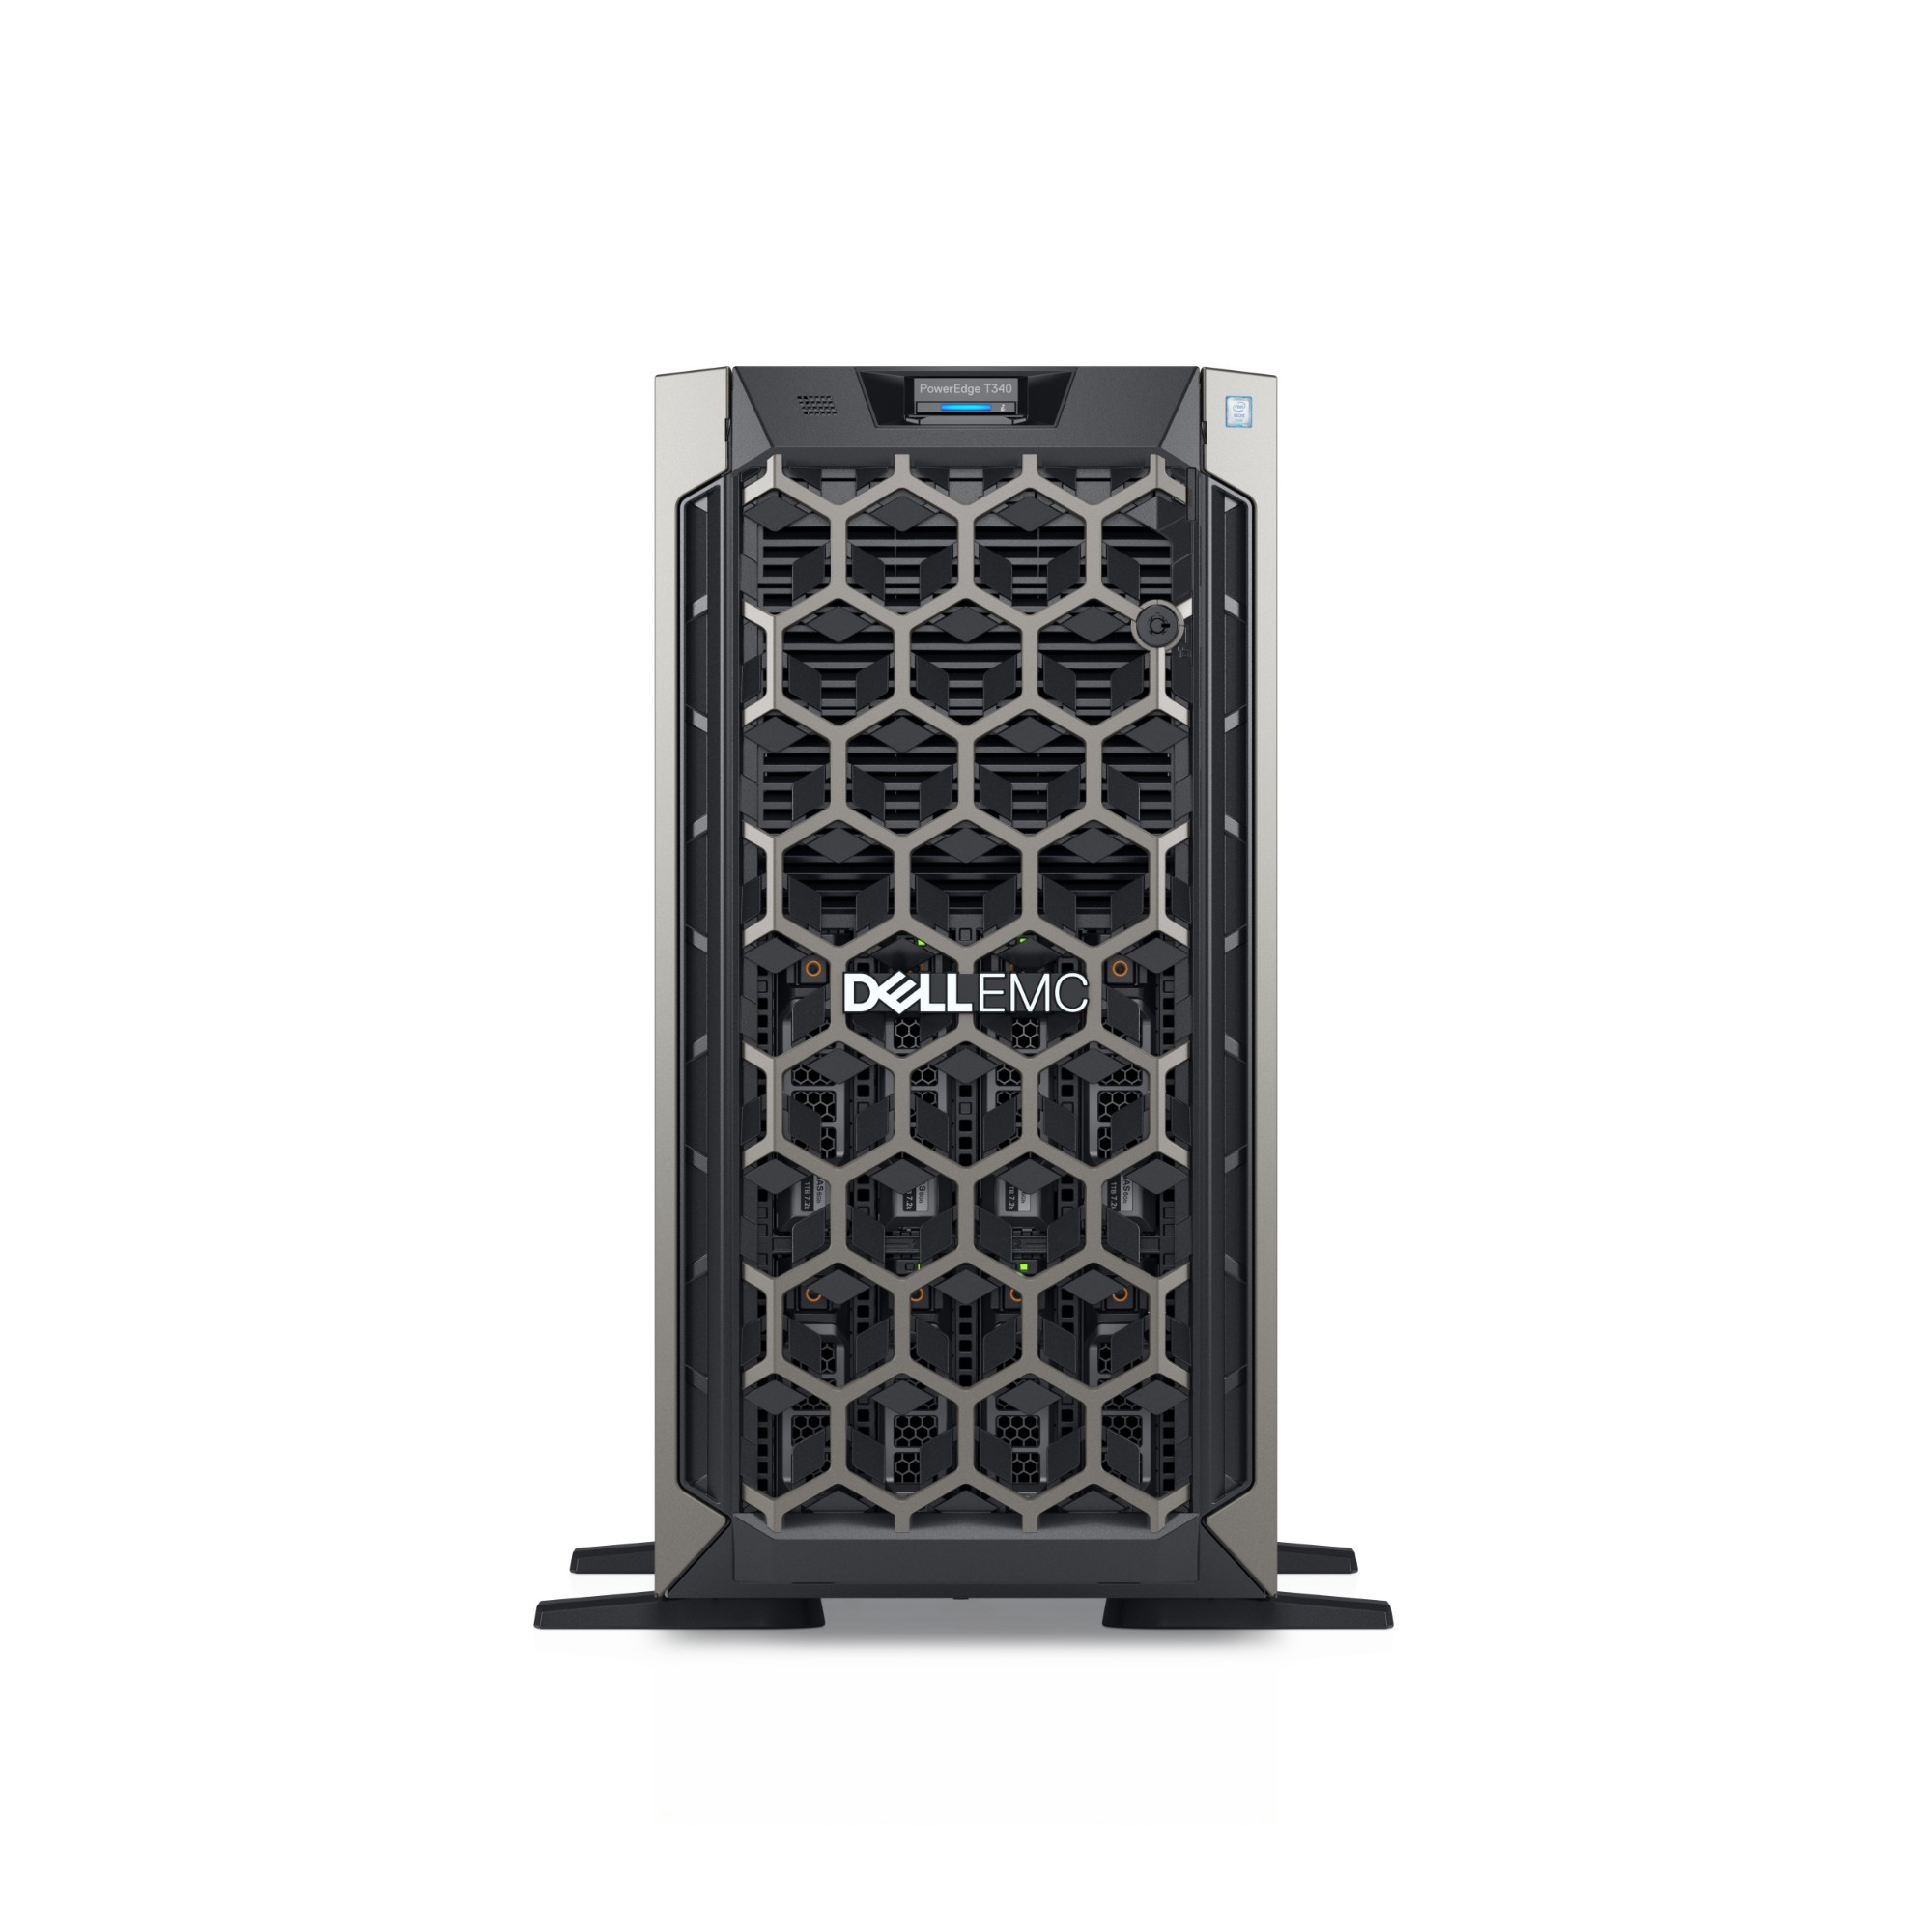 DELL PowerEdge T340 servidor Intel Xeon E 3,5 GHz 16 GB DDR4-SDRAM Tower 495 W